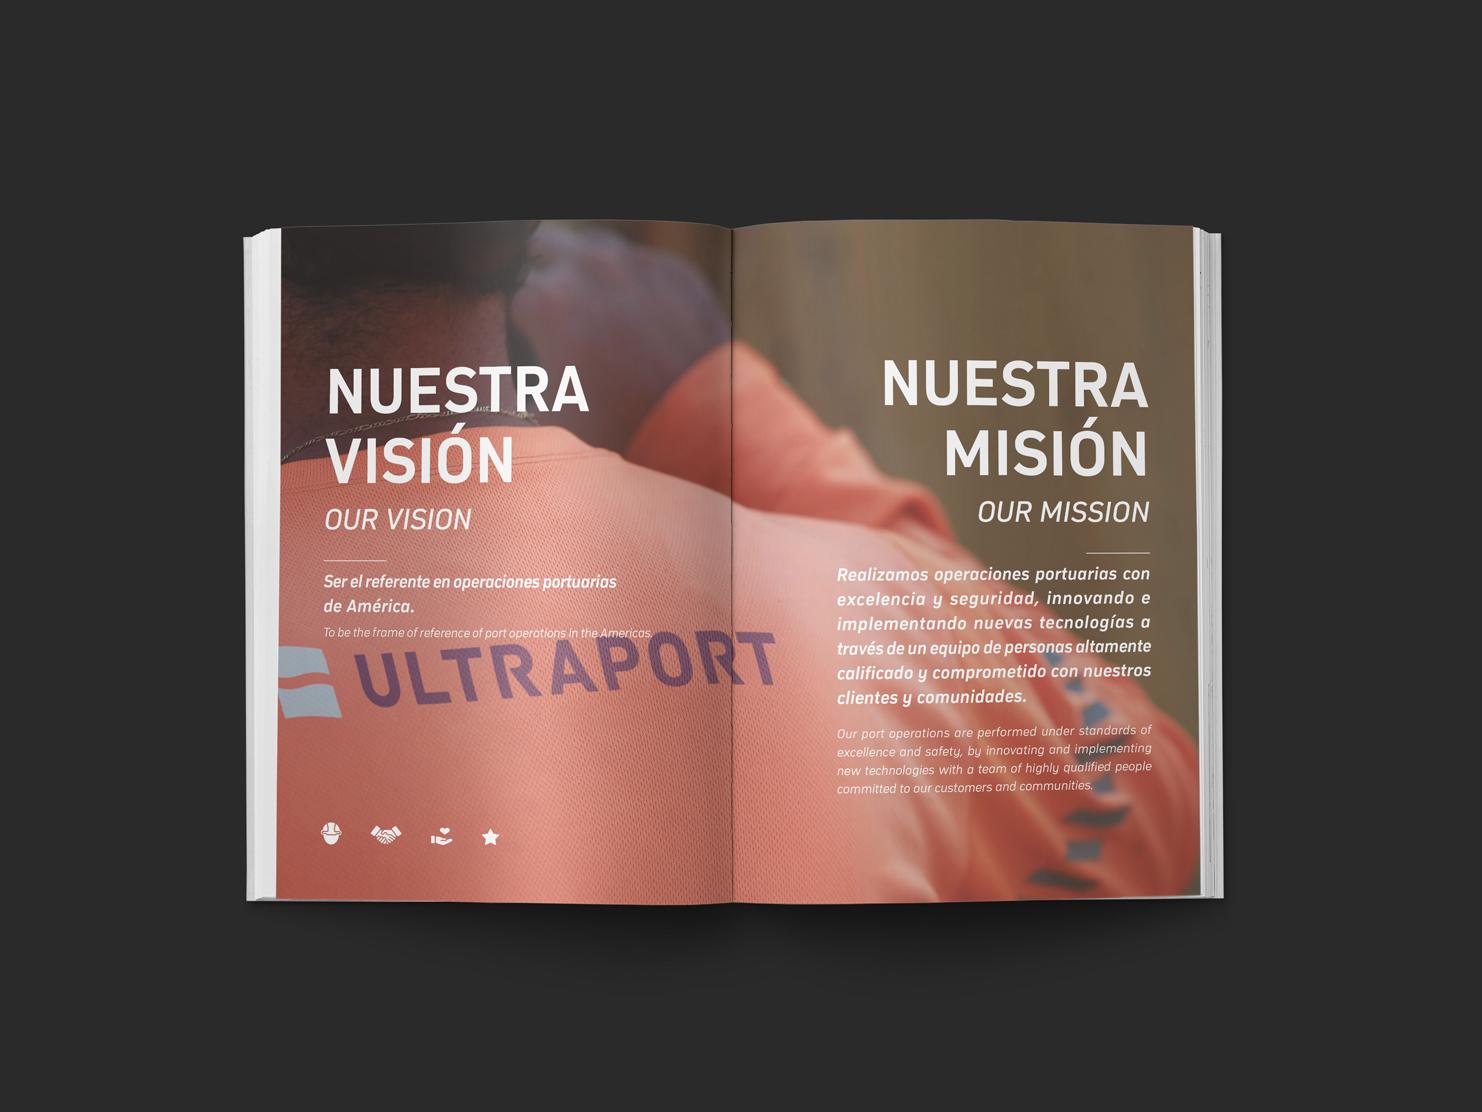 Ultraport2